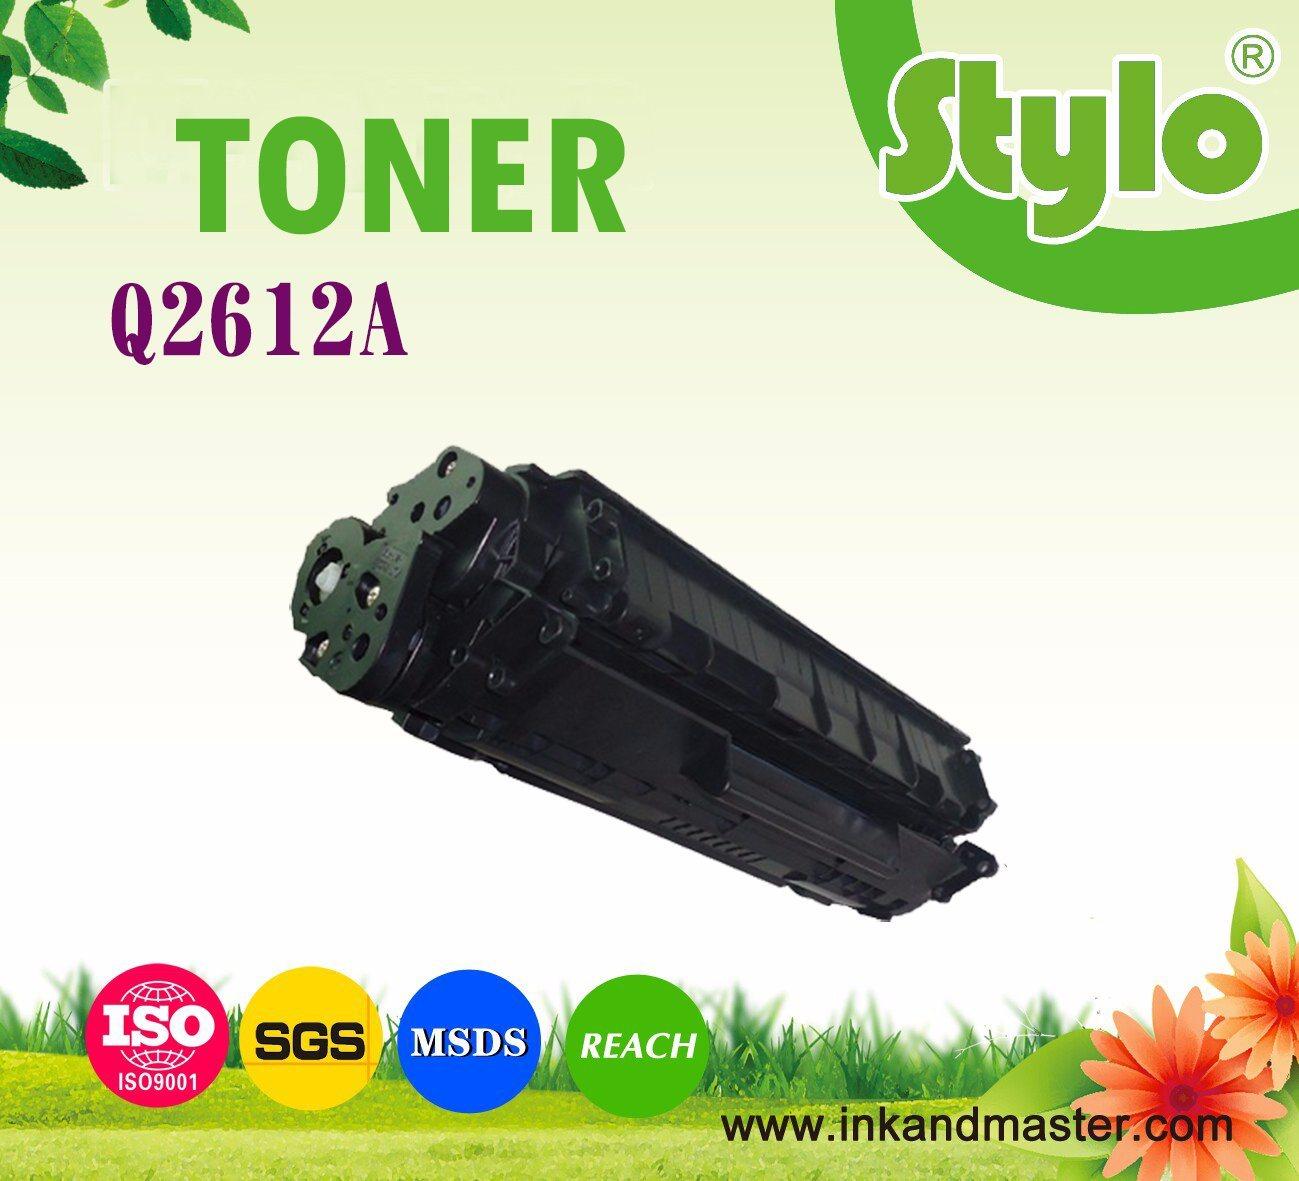 Laser Printer Toner Cartridge 12A (Q2612A) for HP 1010/1015/1012/3015/3020 Printer